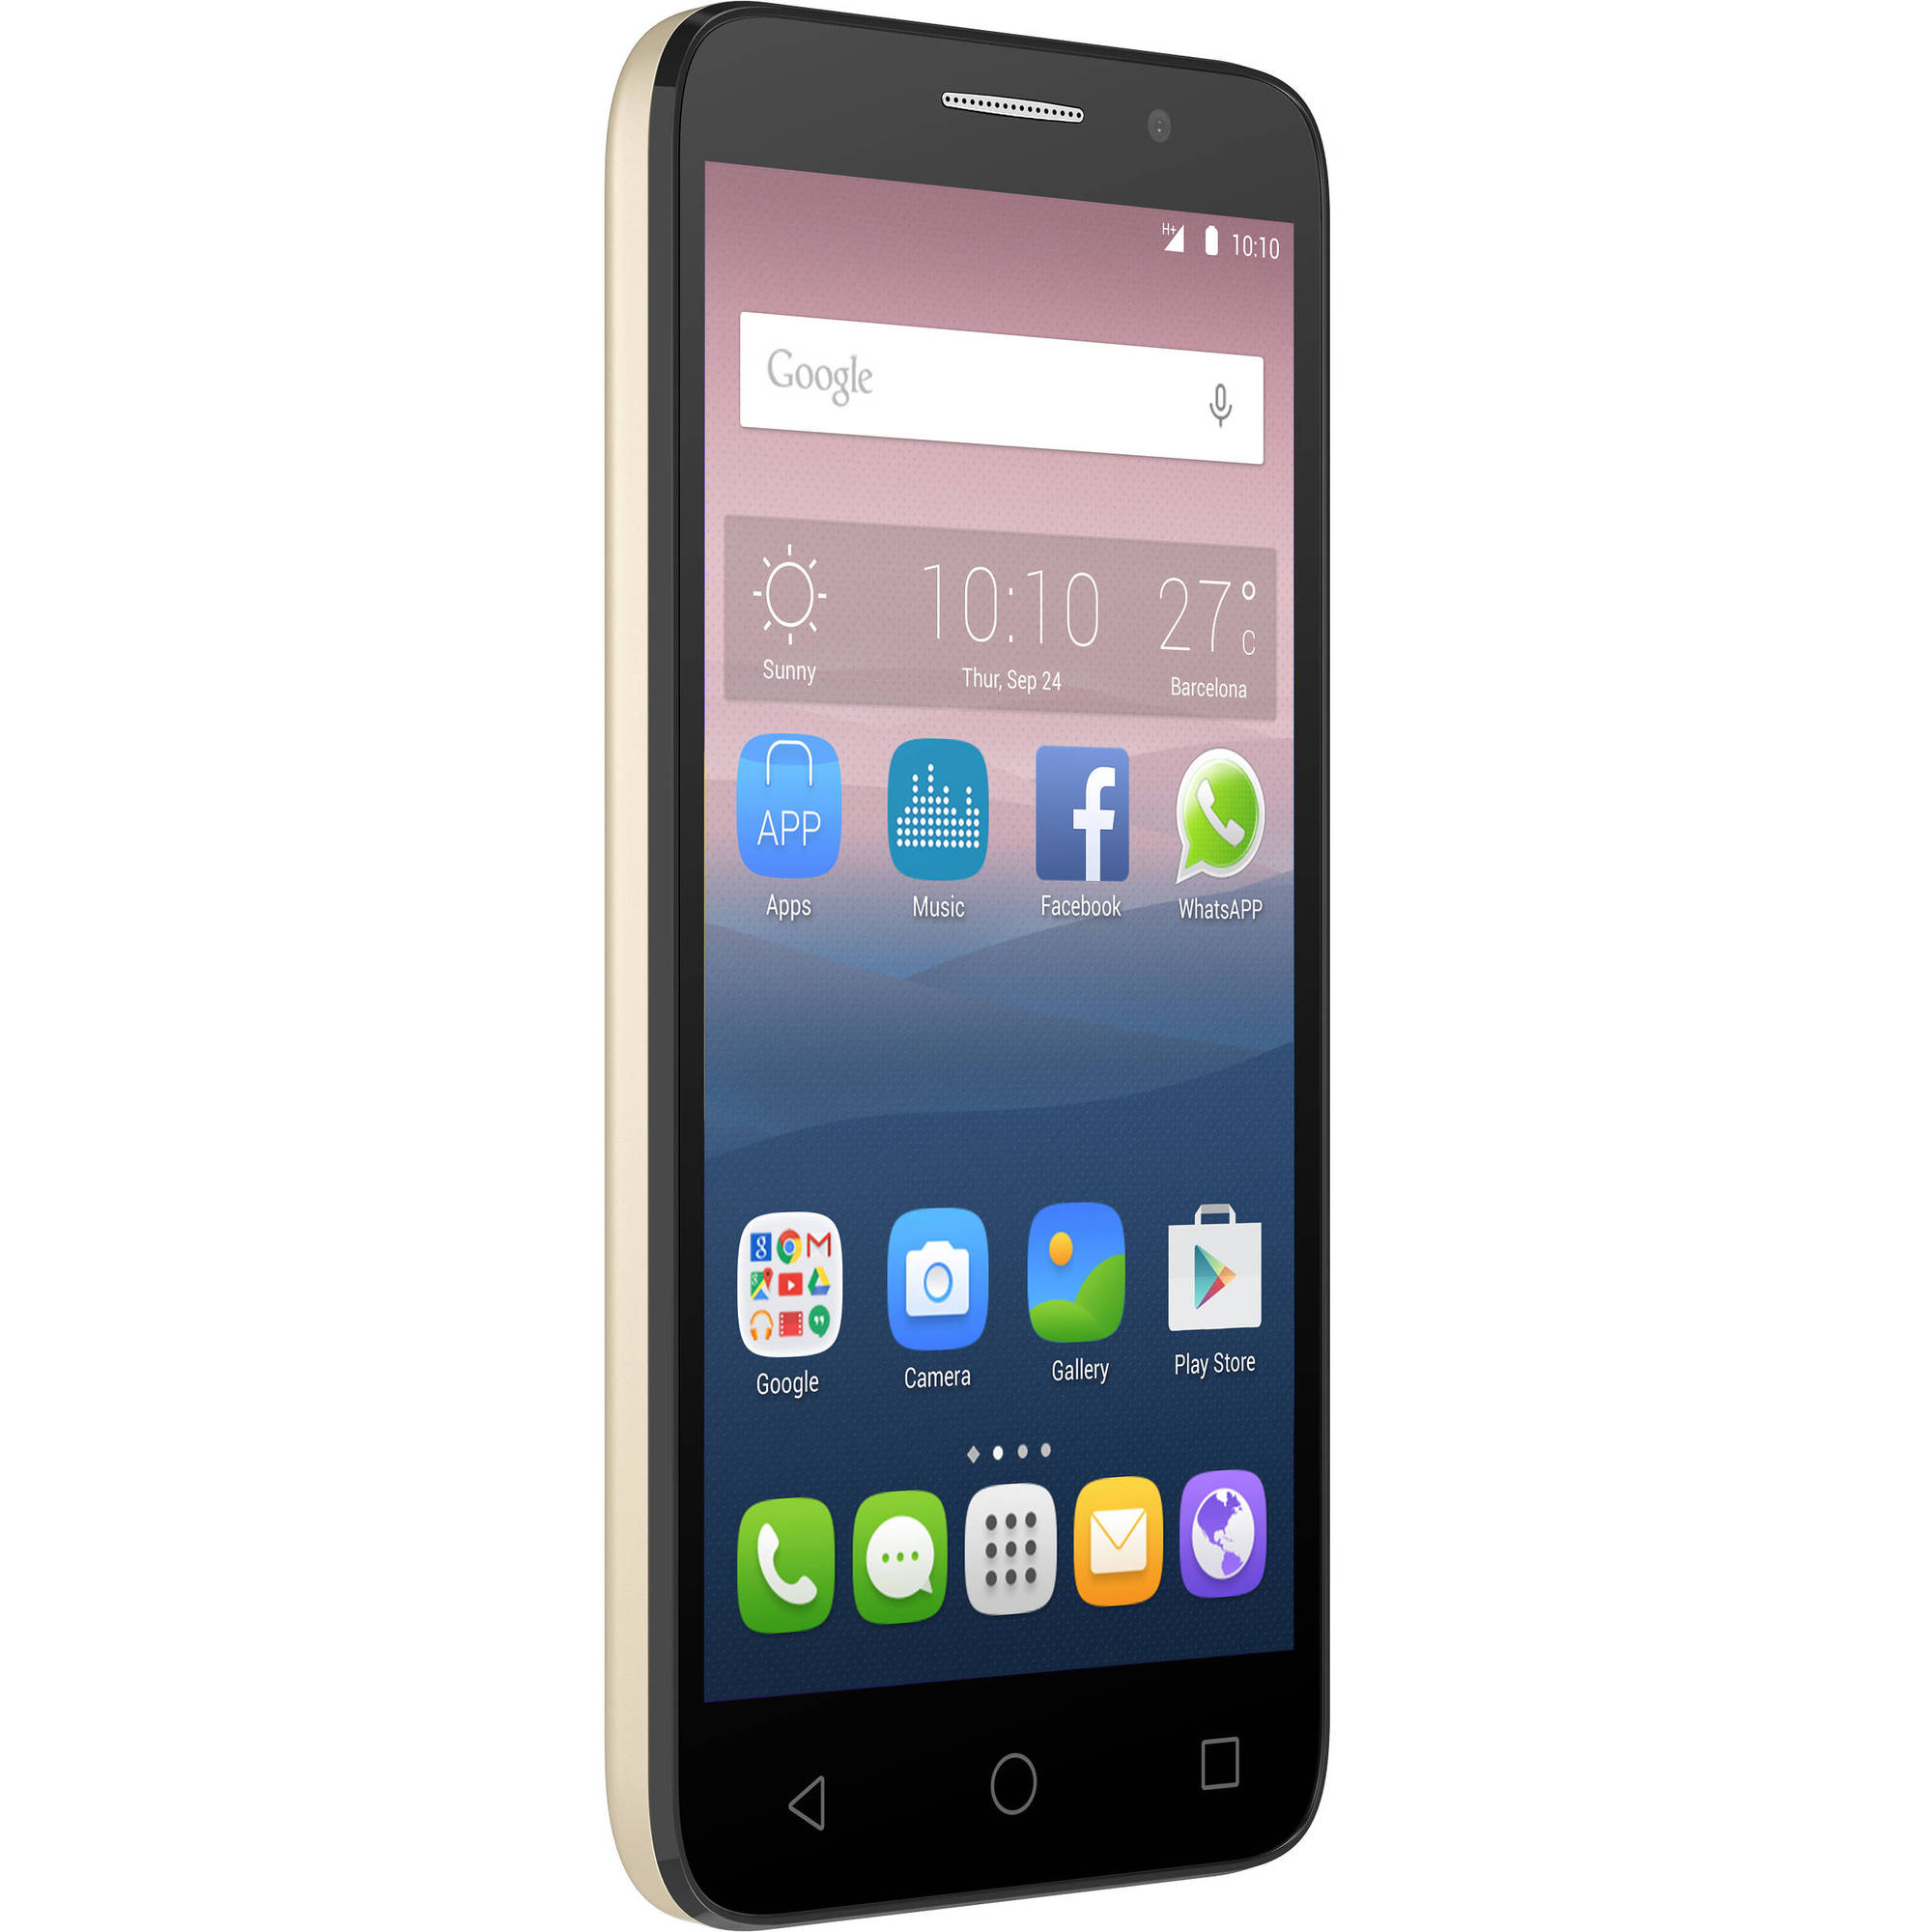 Alcatel OneTouch  Pop 3 Smartphone (Unlocked), Gold, Walmart Exclusive